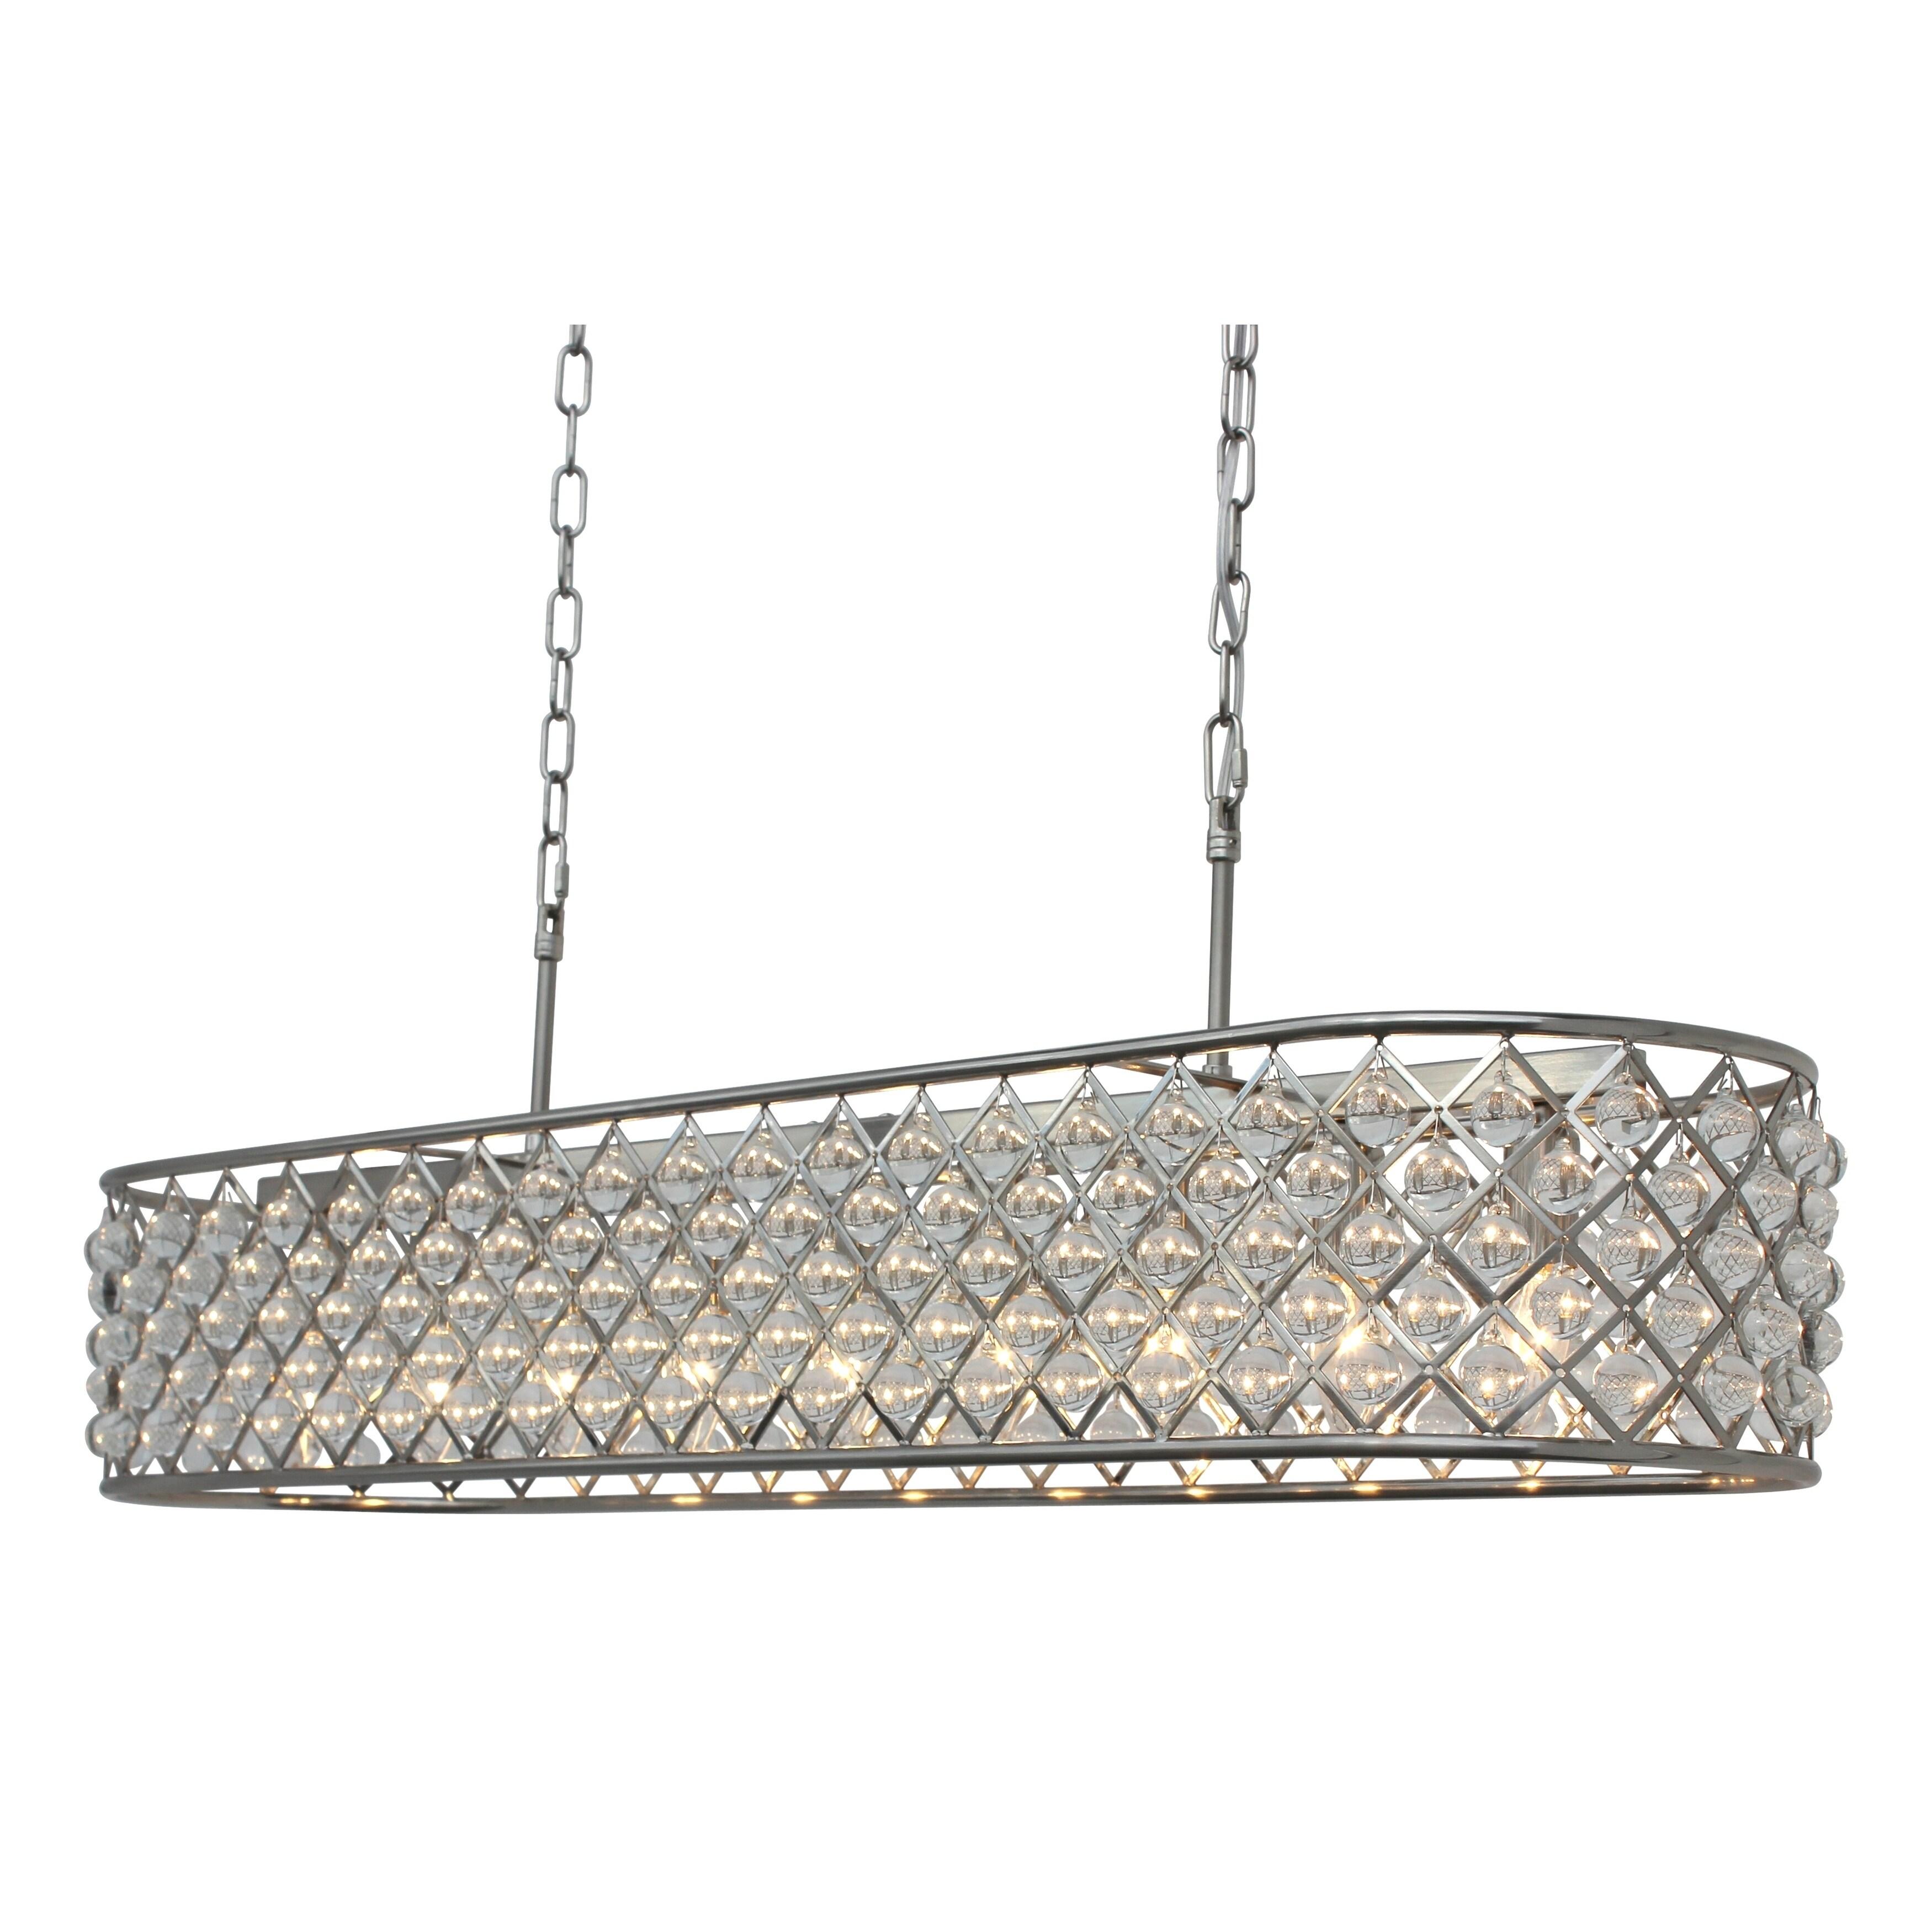 Cassiel 40 inch rectangular crystal chandelier brushed nickel n a